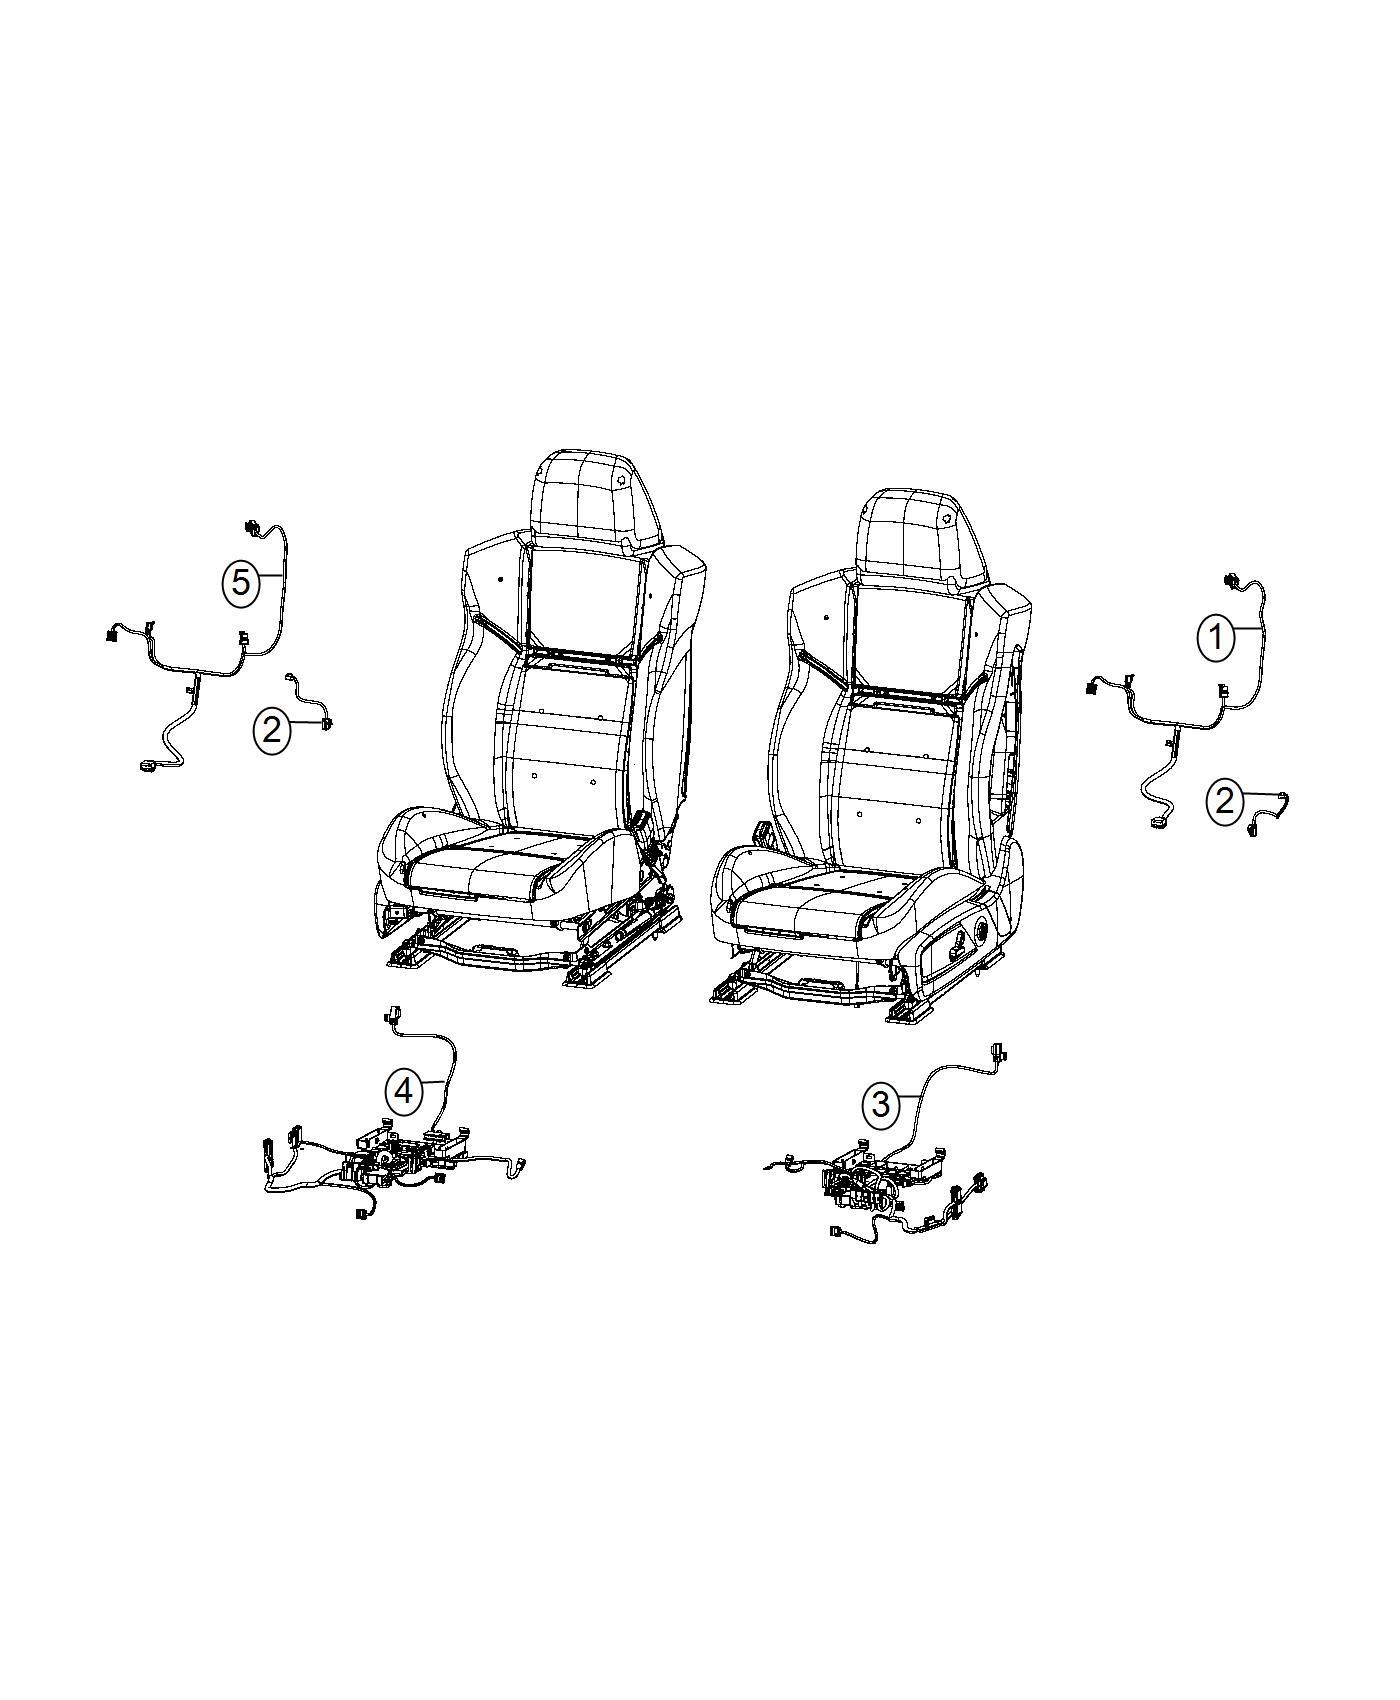 2017 Dodge Charger Wiring  Seat Cushion  Passenger  Trim